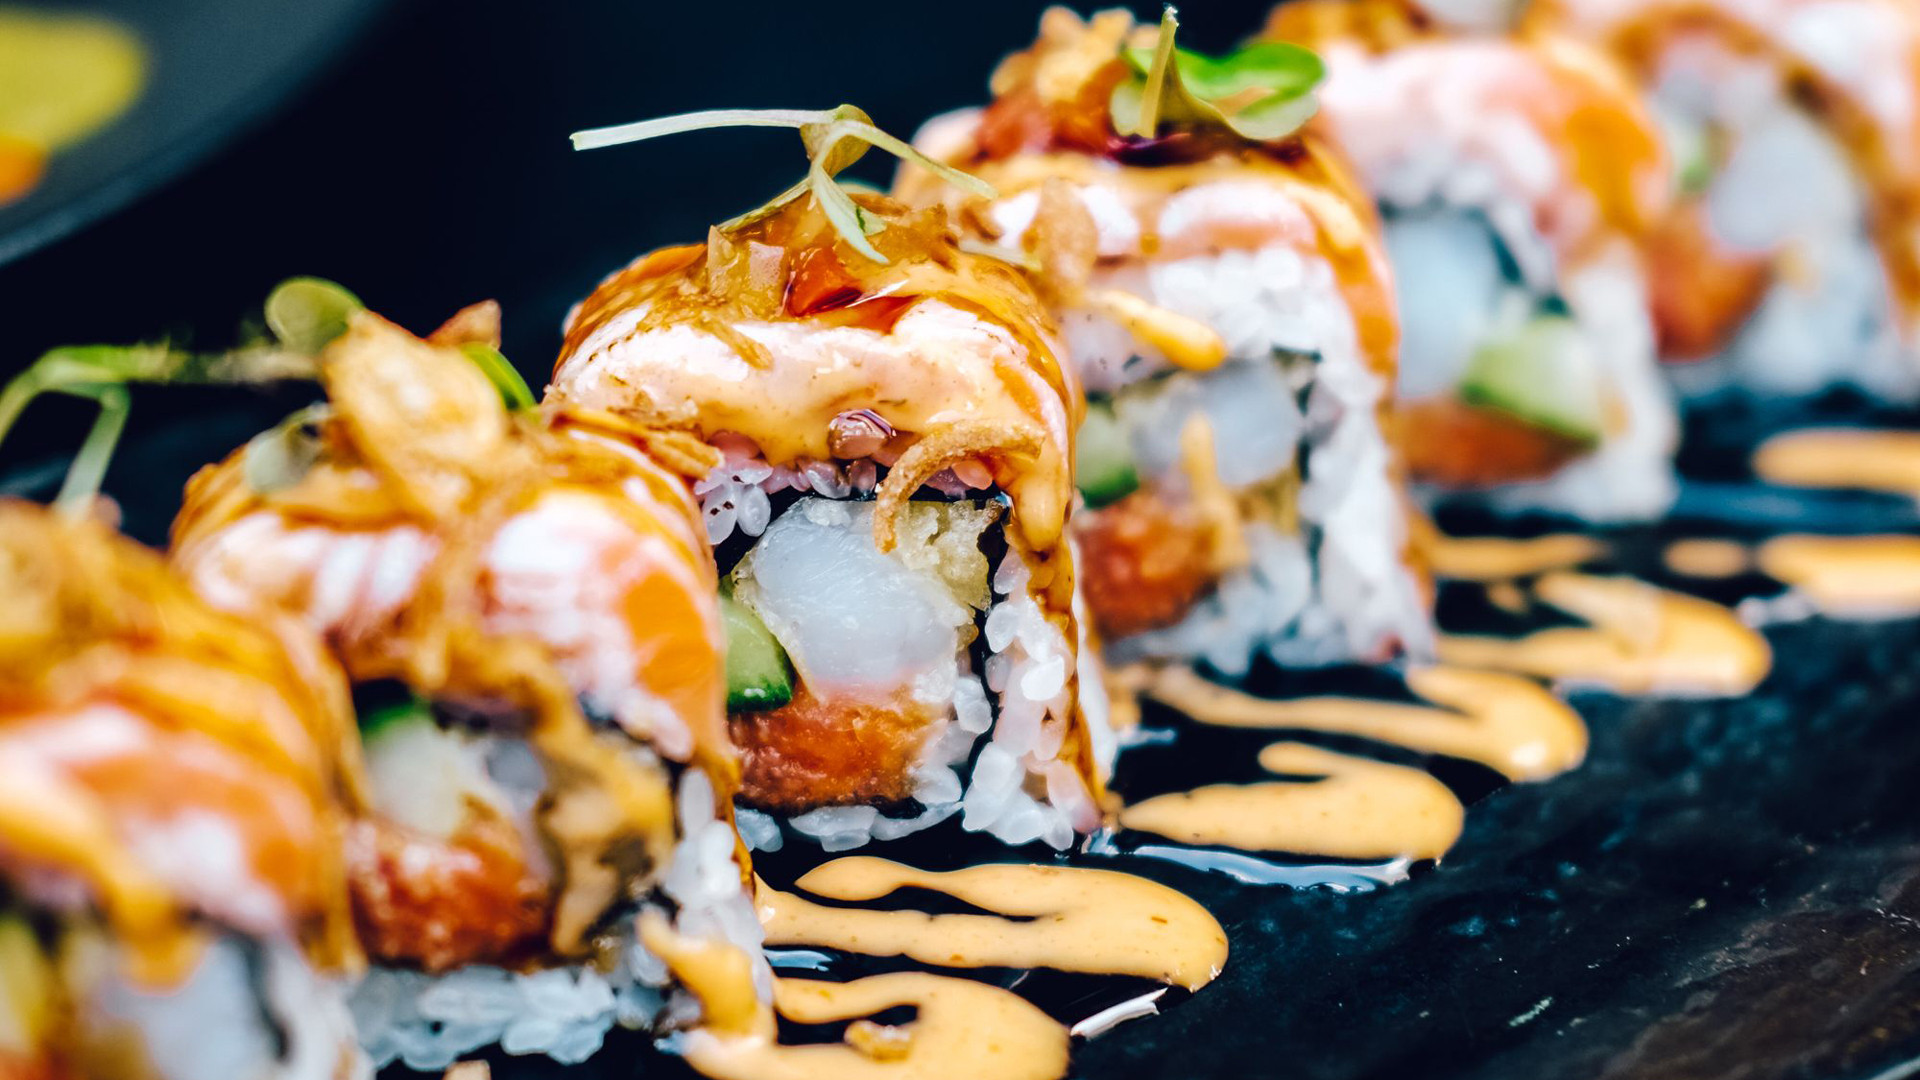 The Bisha Hotel Toronto | Maki roll sushi at Akira Back Japanese restaurant